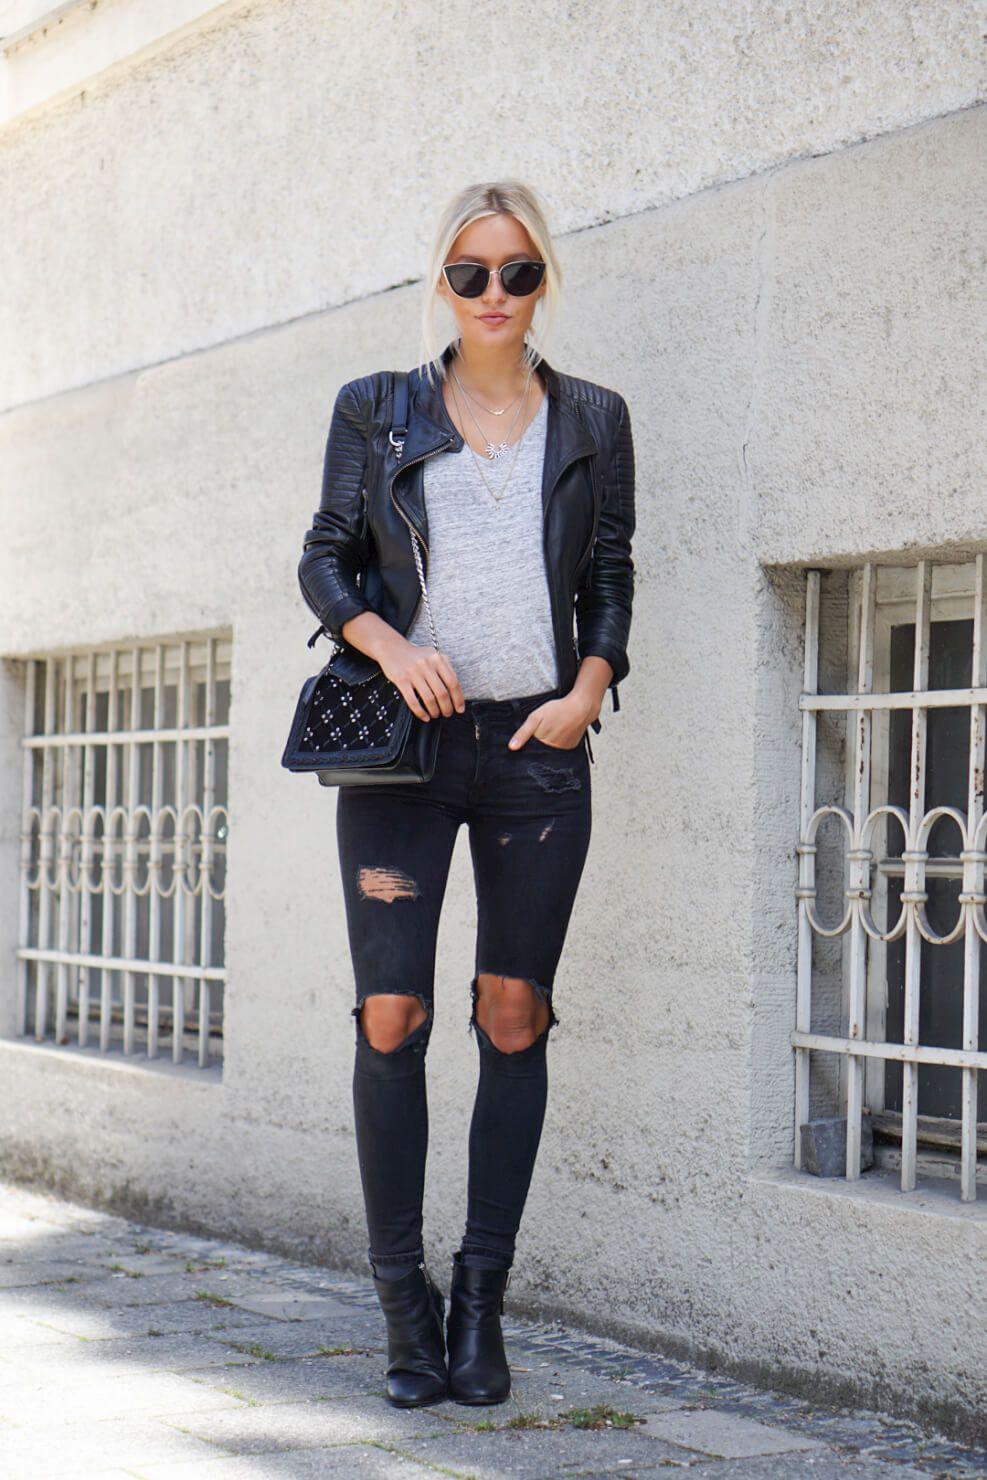 Black Ripped Jeans Faux Leather Jacket Joliejanine Com Black Jeans Denim Fashion Black Ripped Jeans [ 1480 x 987 Pixel ]